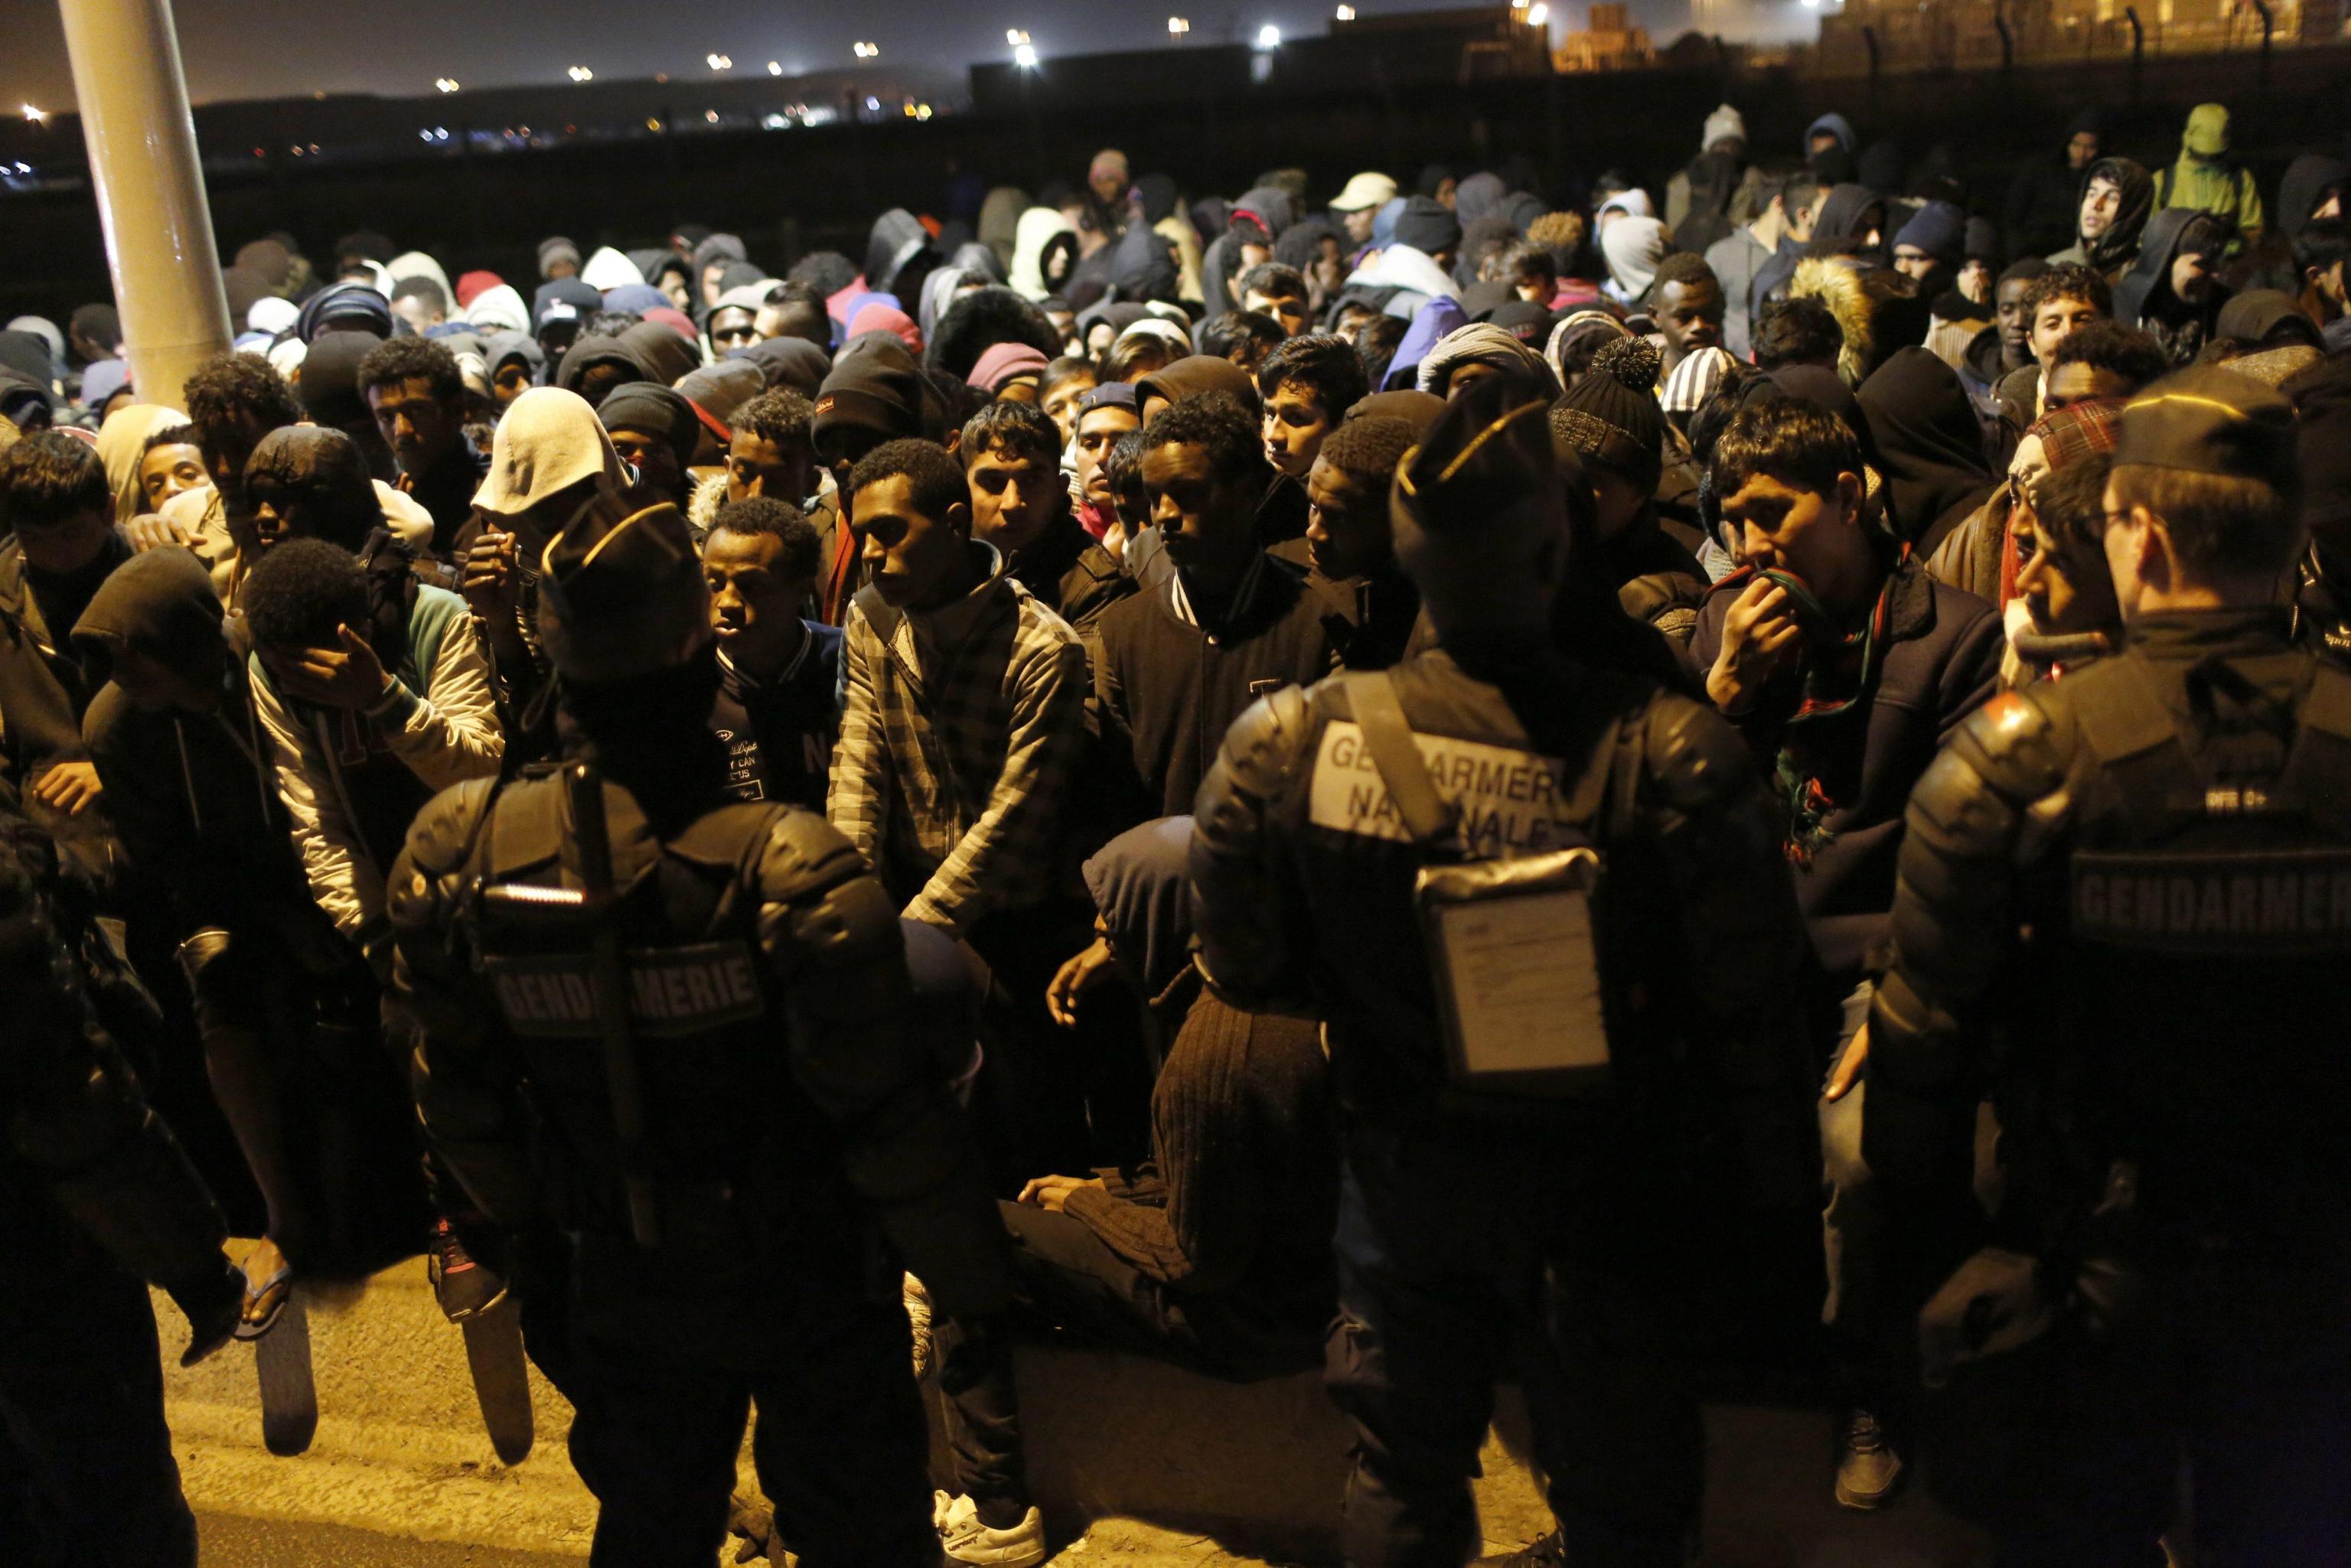 Torture ai migranti in Libia, tre fermi a Messina